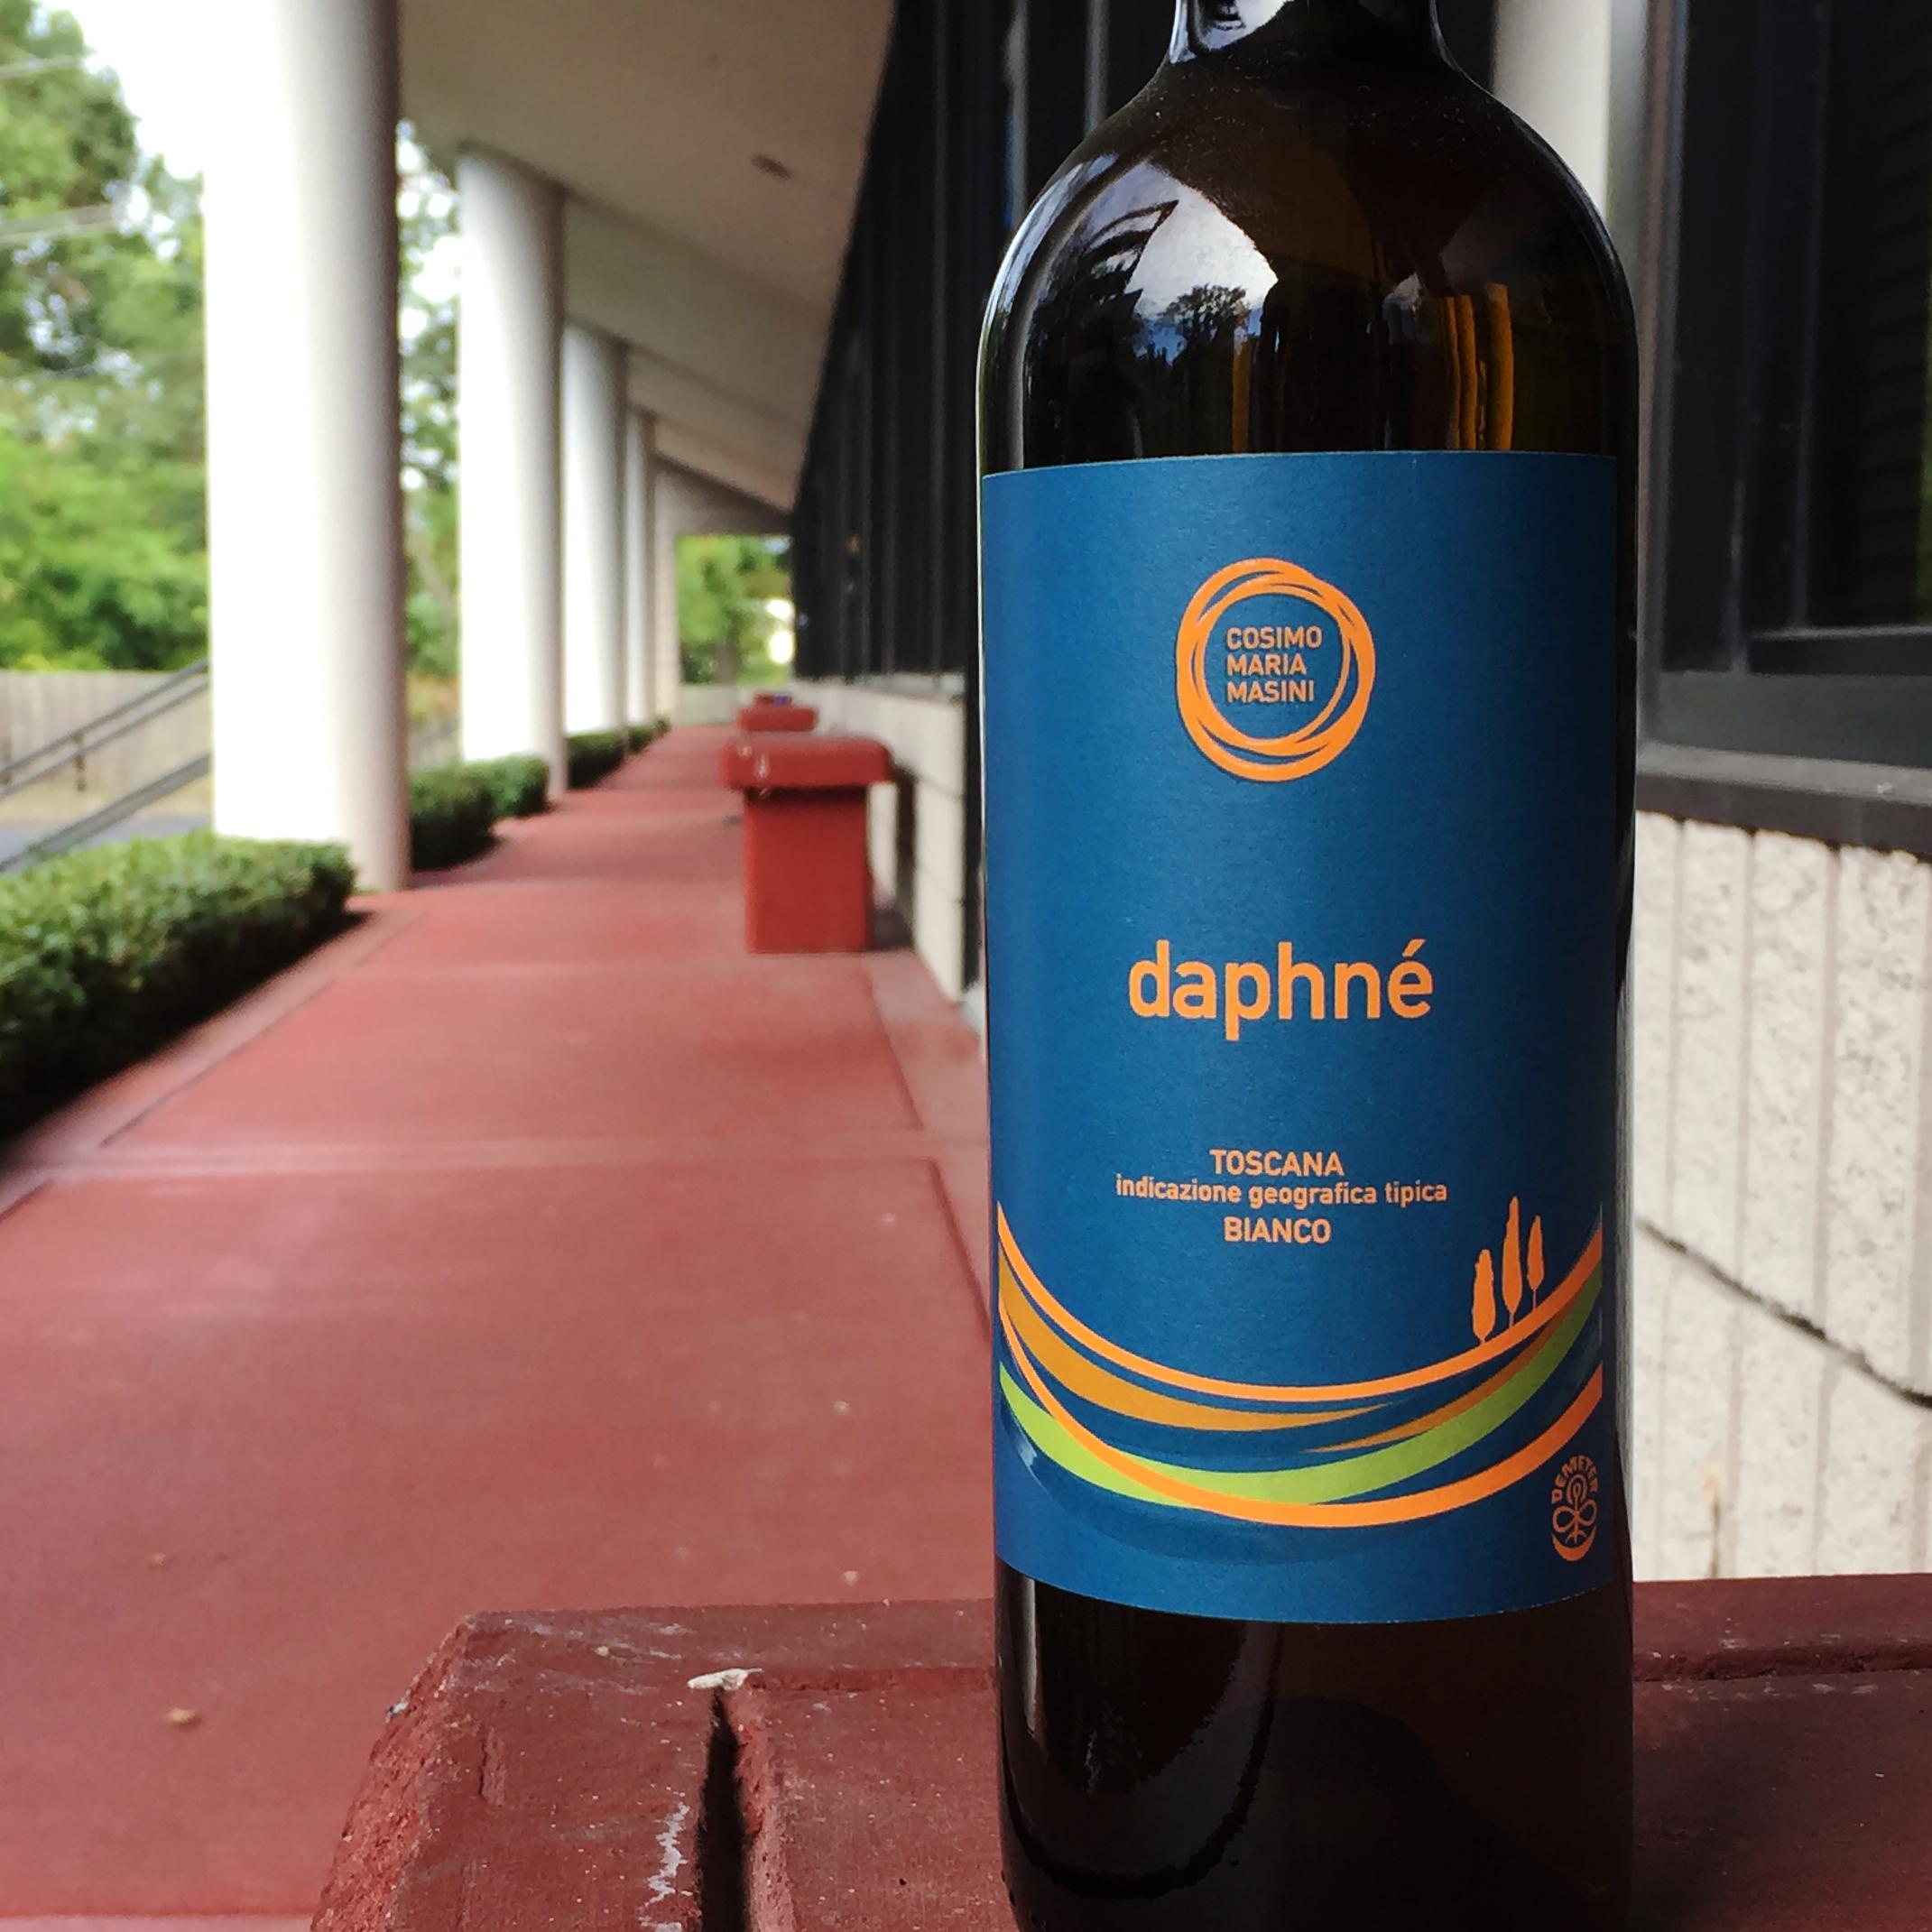 daphne1.jpg